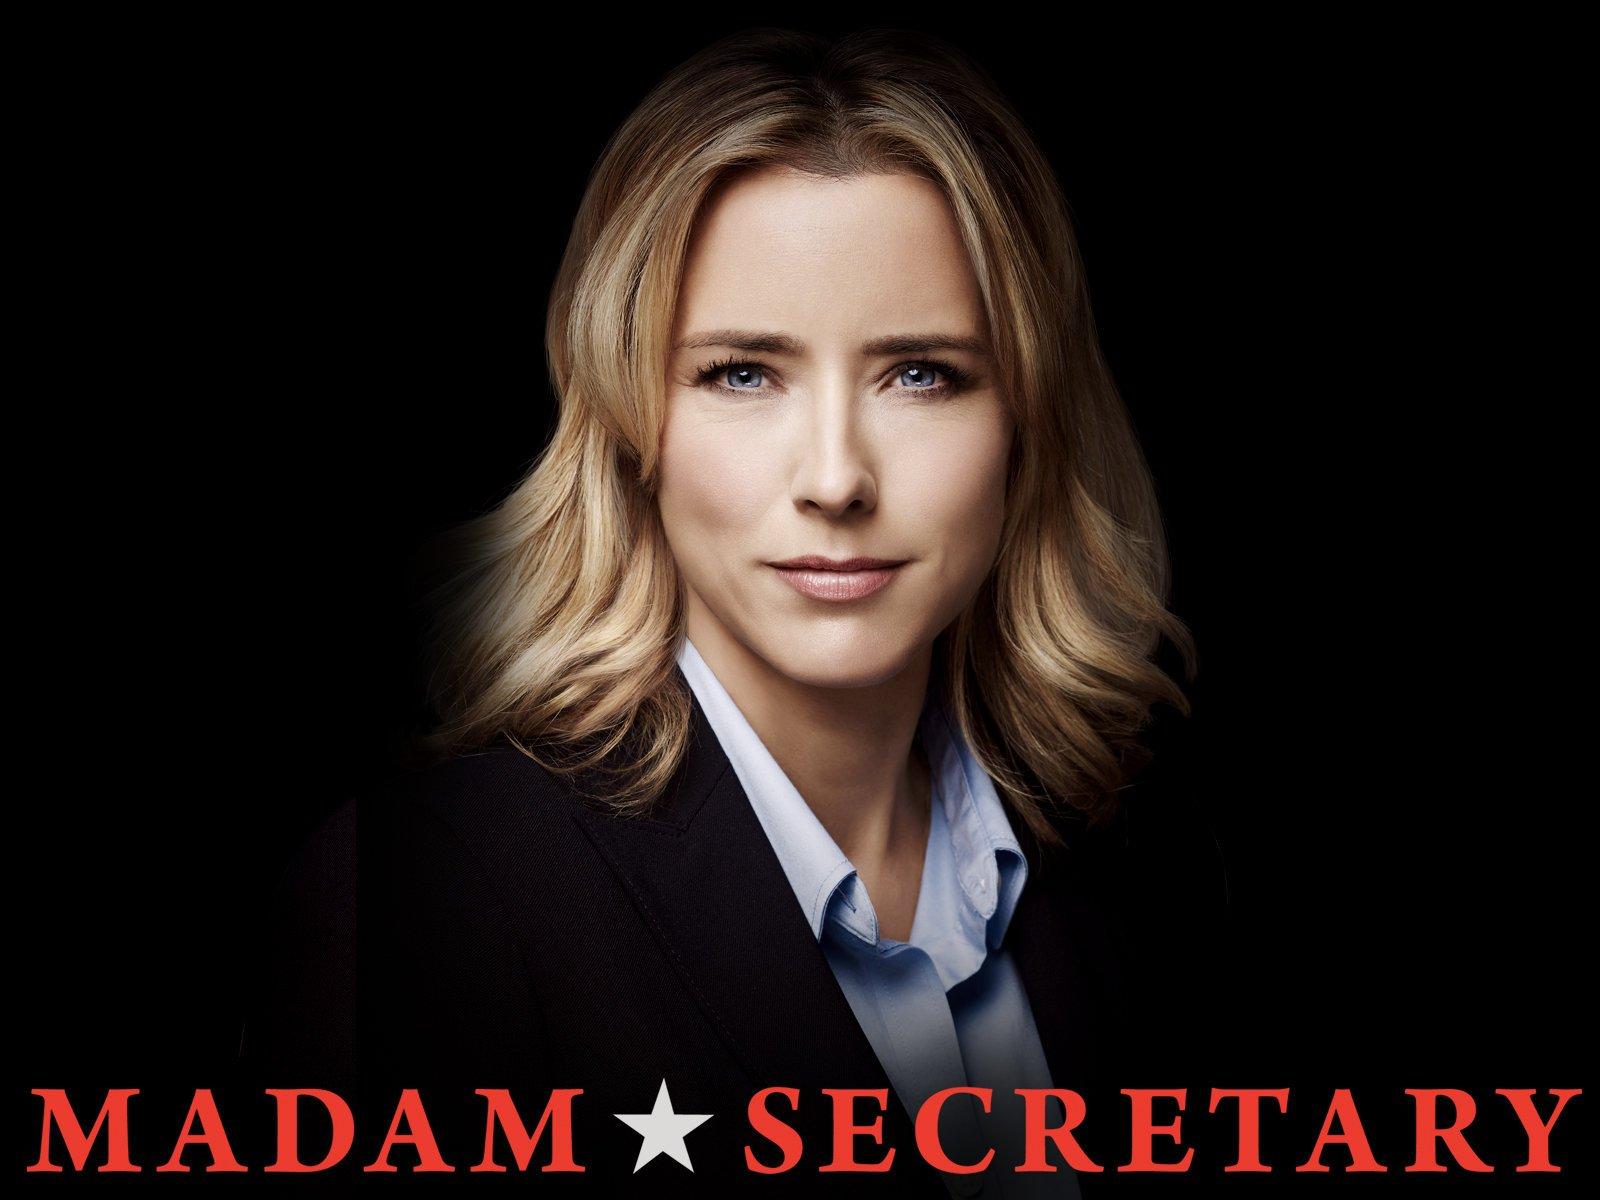 amazon com madam secretary season 1 amazon digital services llc